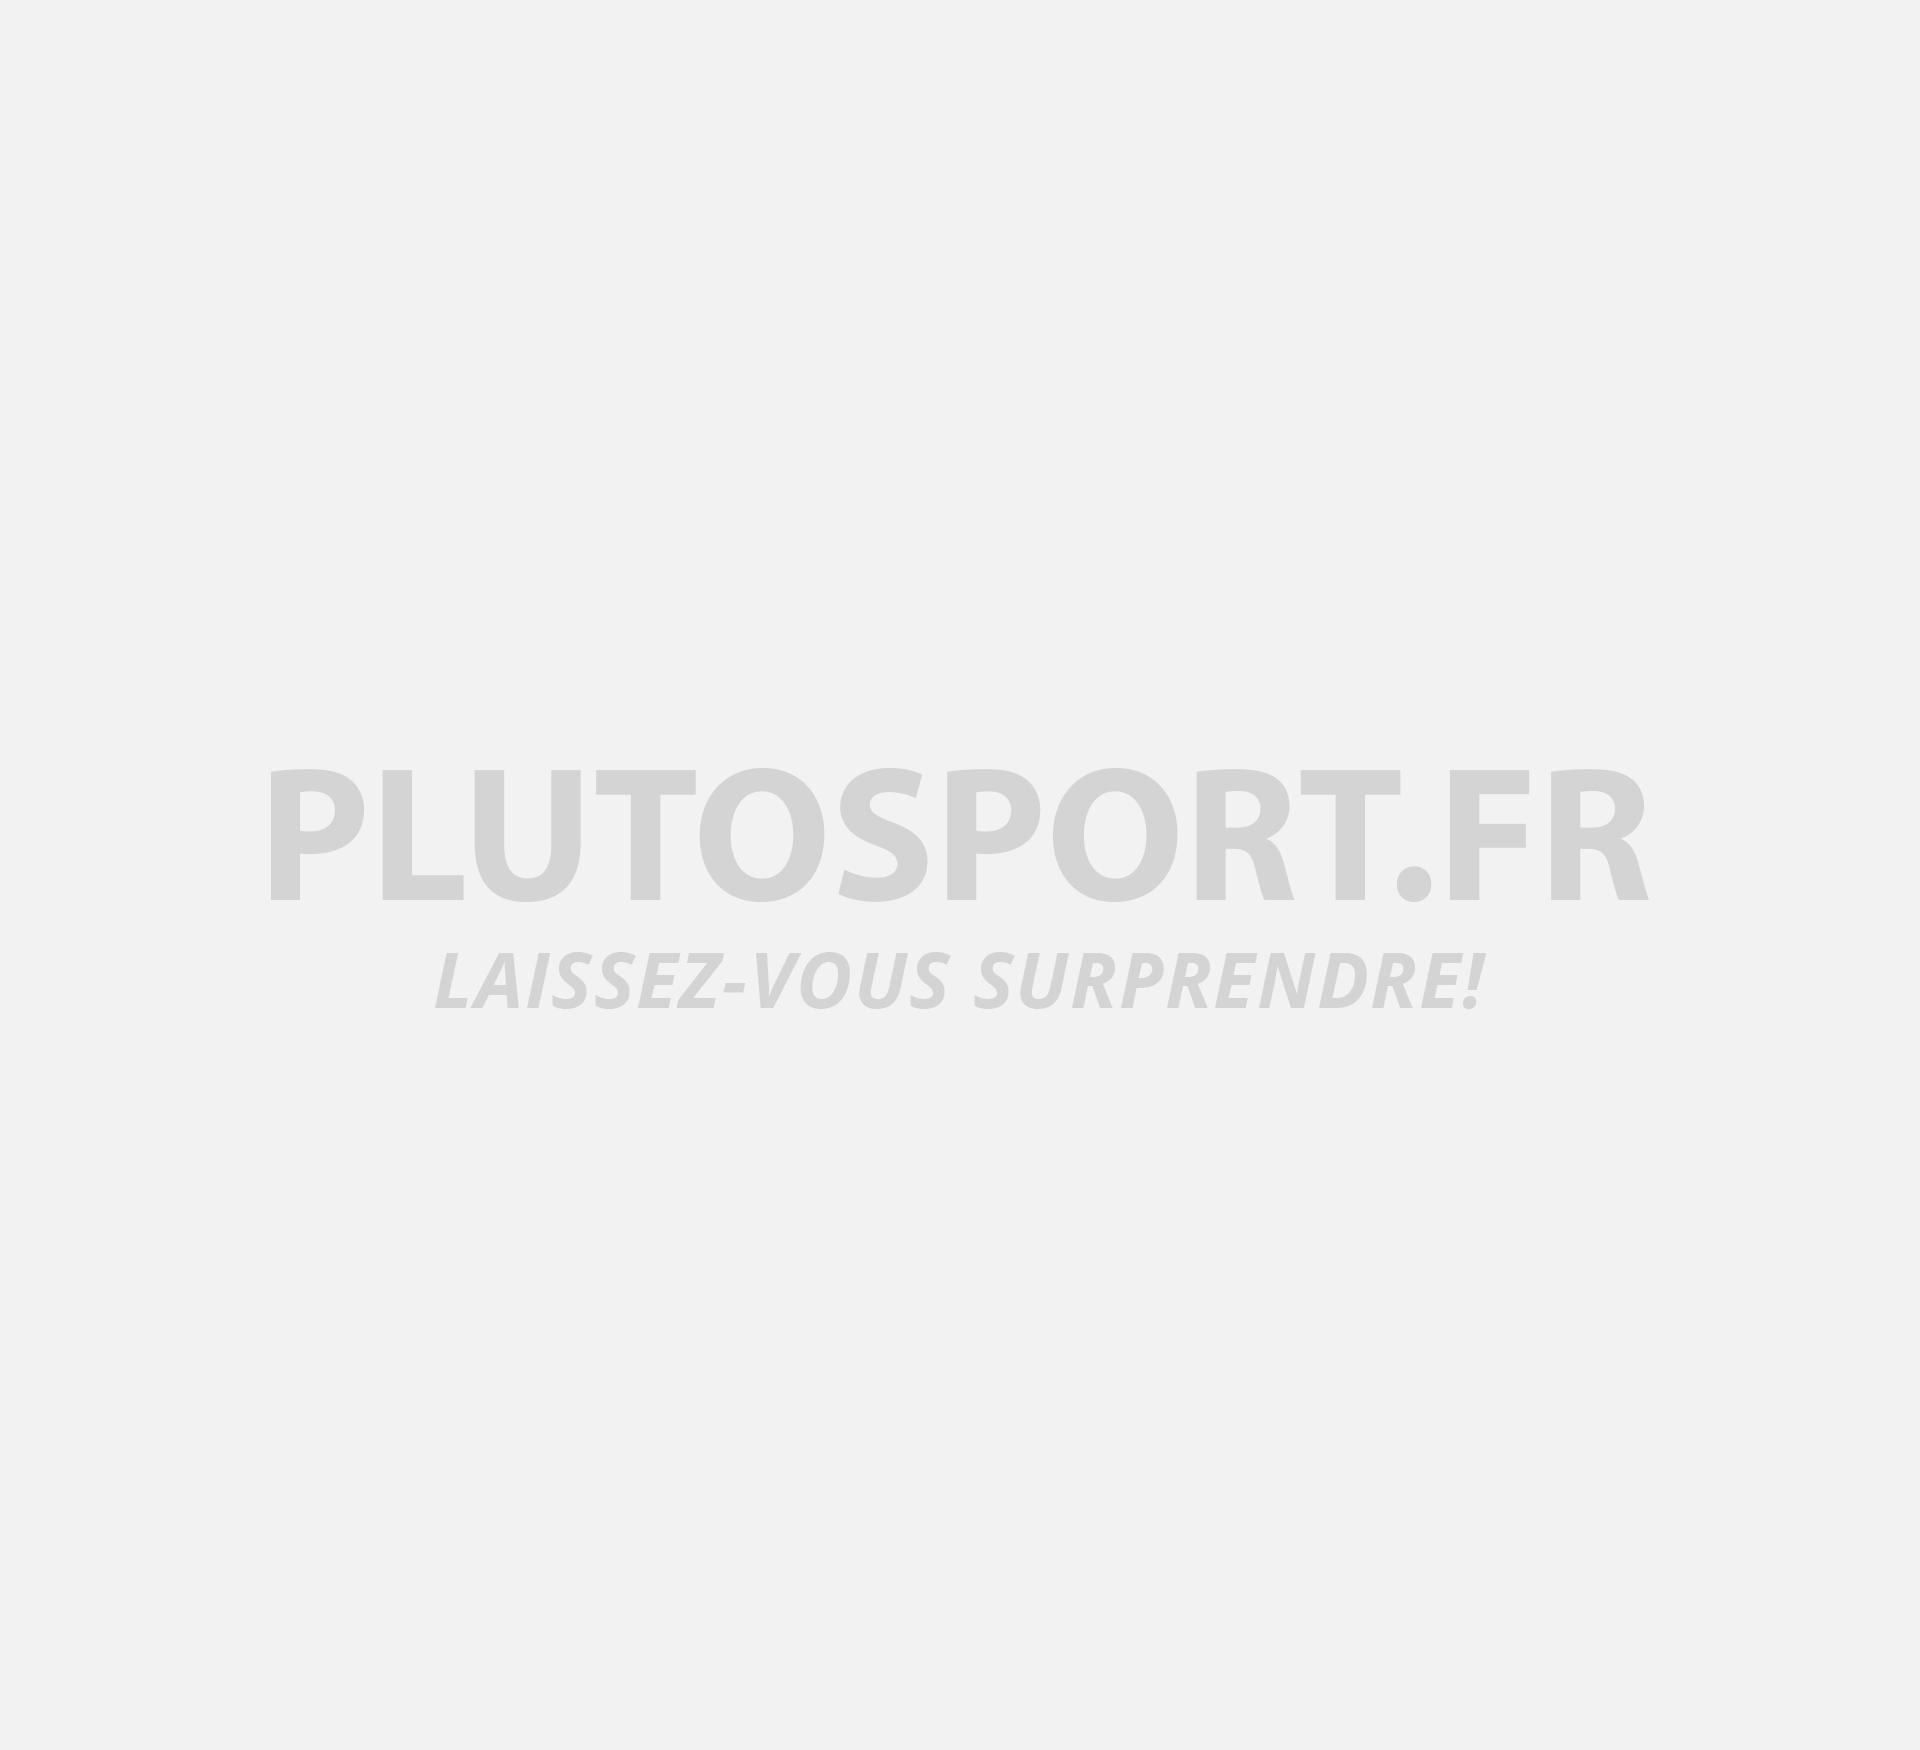 Calvin Klein Chaussettes Senior (3-pack)